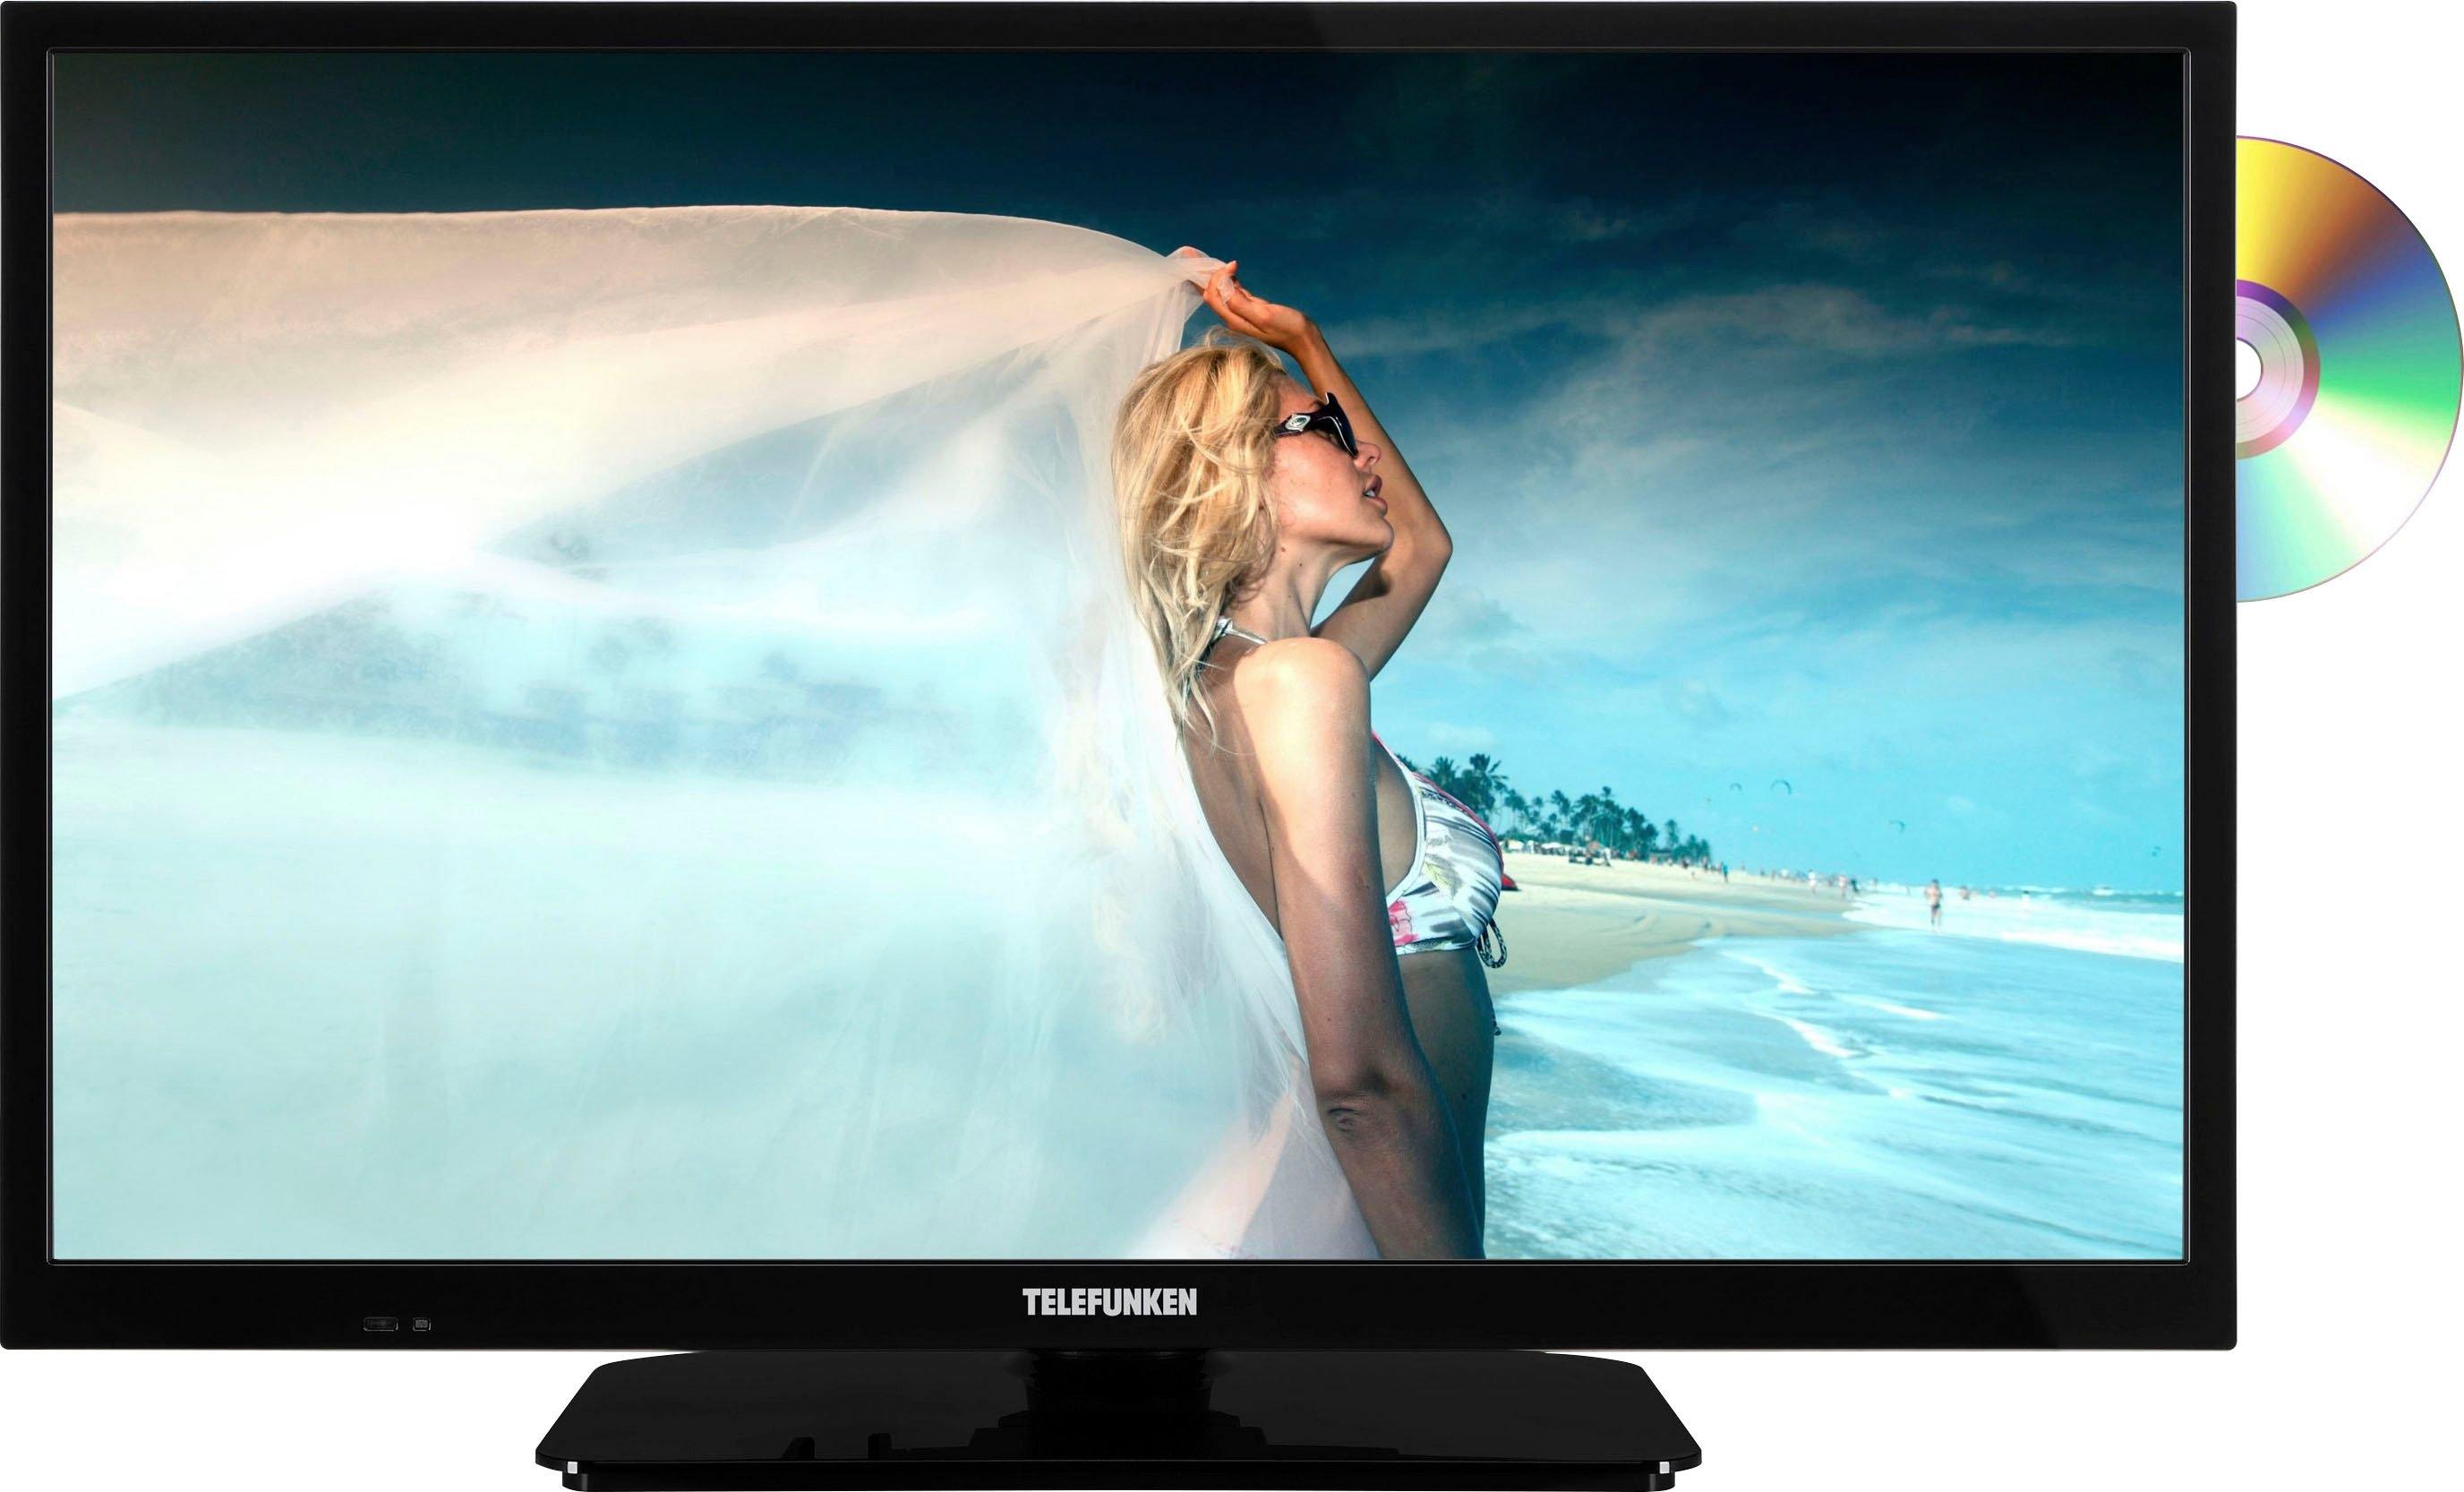 Telefunken »L24H550M4D« LED-TV - verschillende betaalmethodes